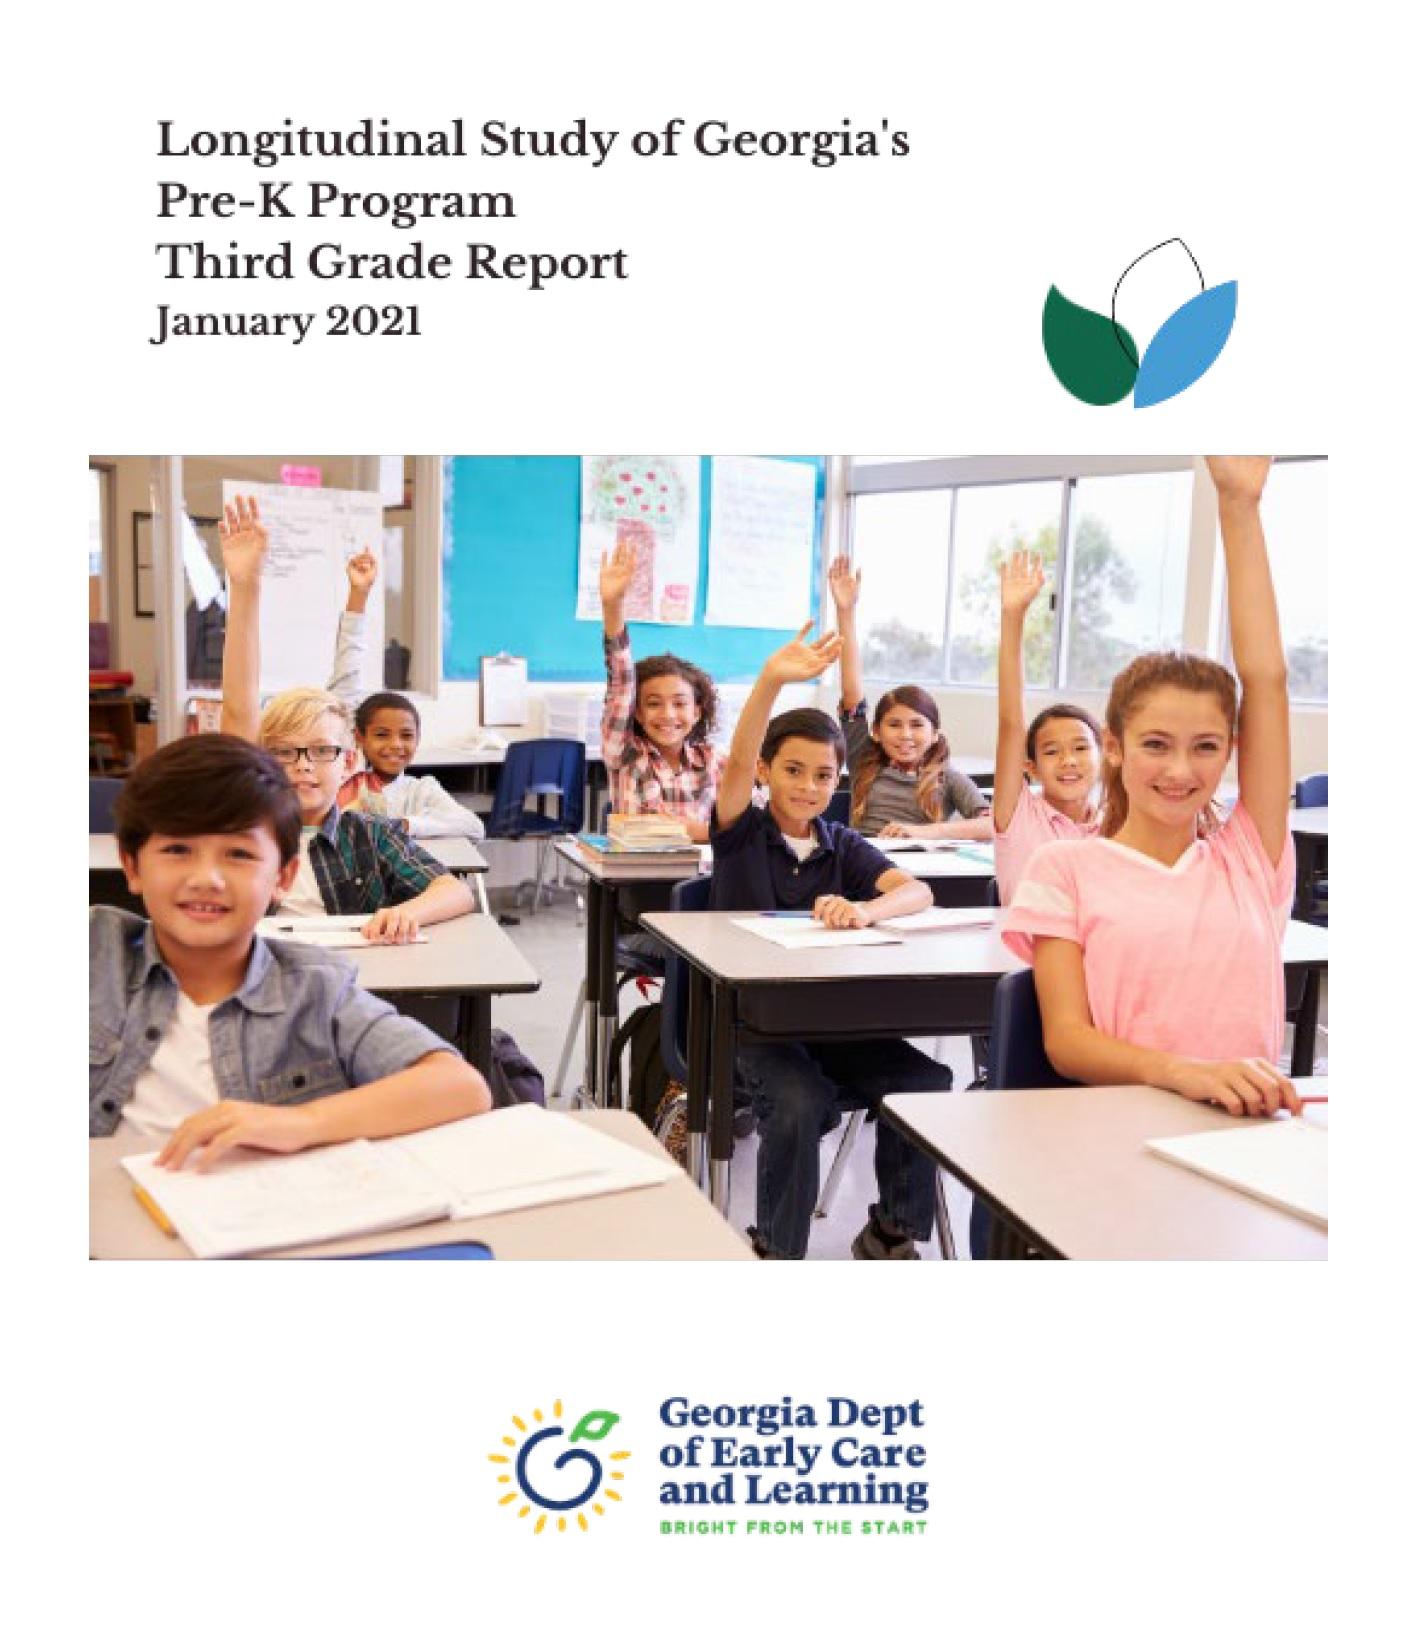 cover of Longitudinal Study of Georgia's Pre-K Program: Third Grade Report with school children raising hands in classroom